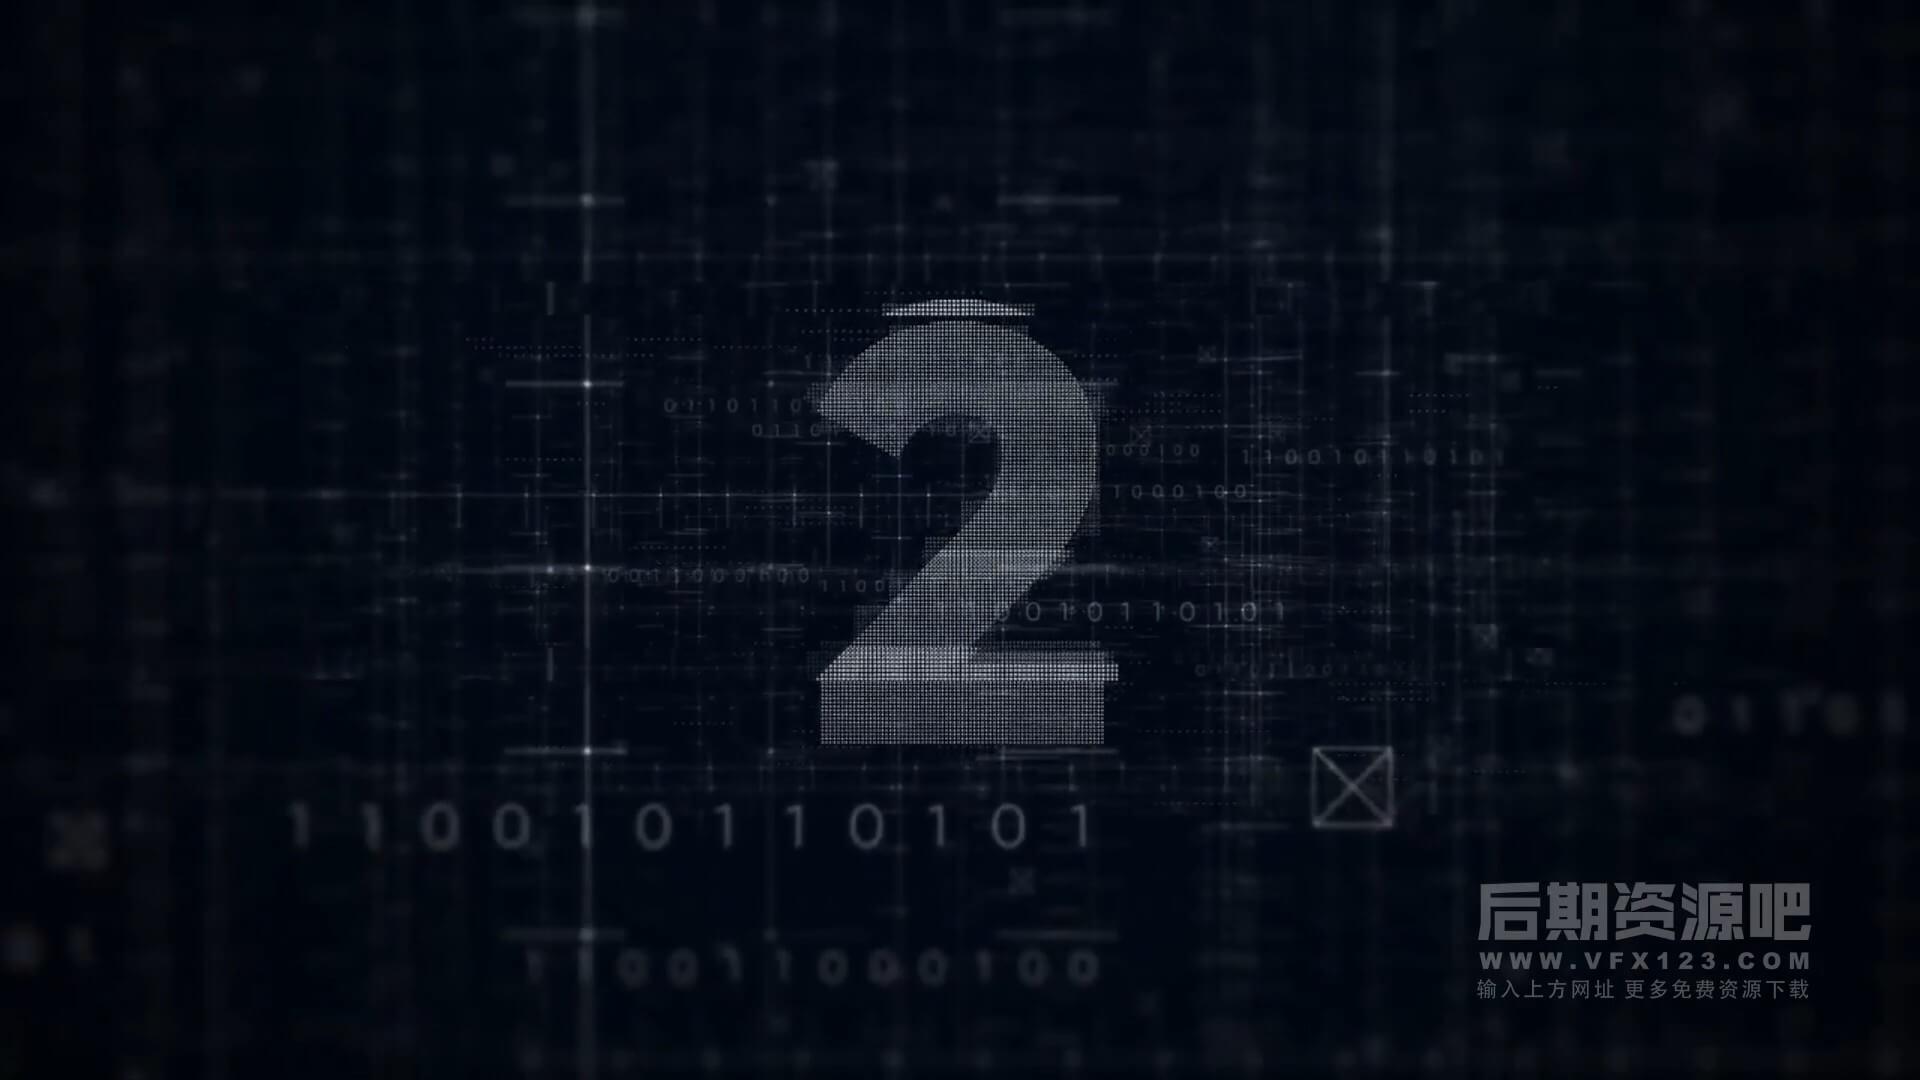 fcpx插件 适用数码科技汽车发布会倒计时 Countdown  Digital Opener